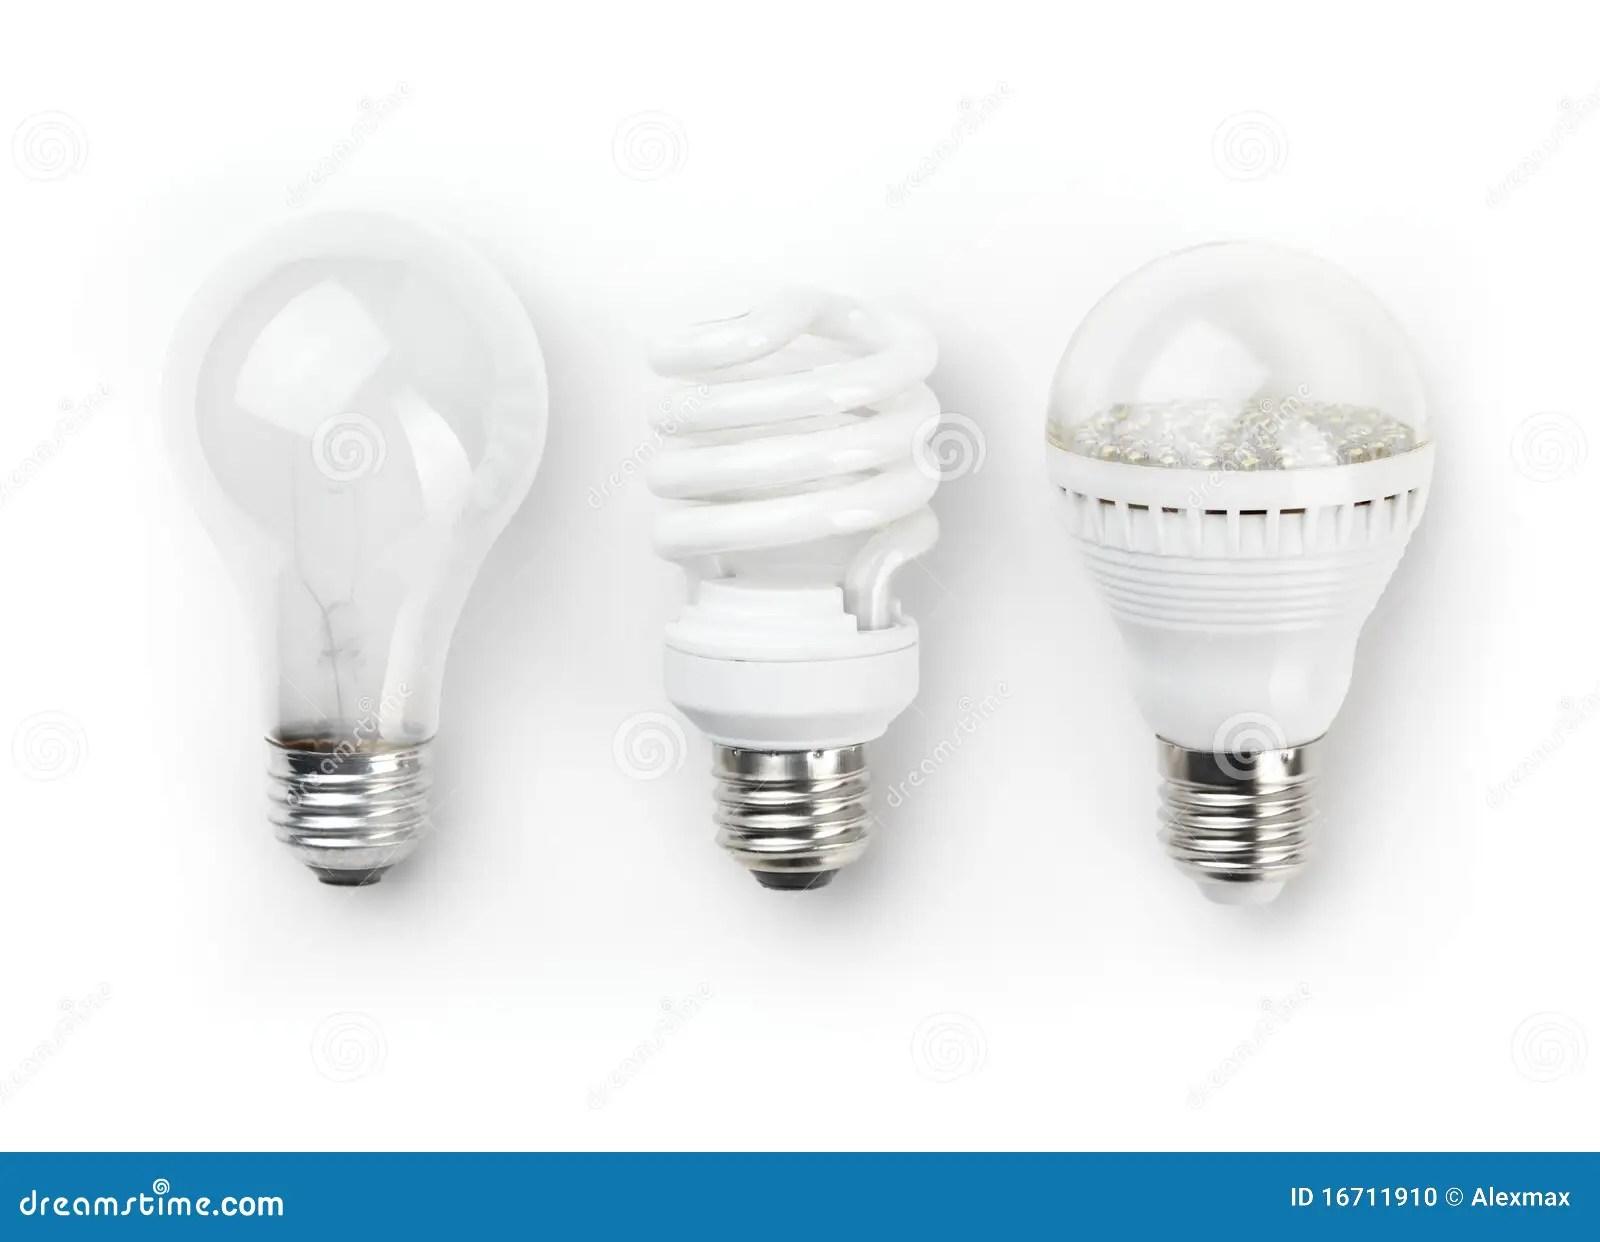 Light Major Manufacturers Bulb